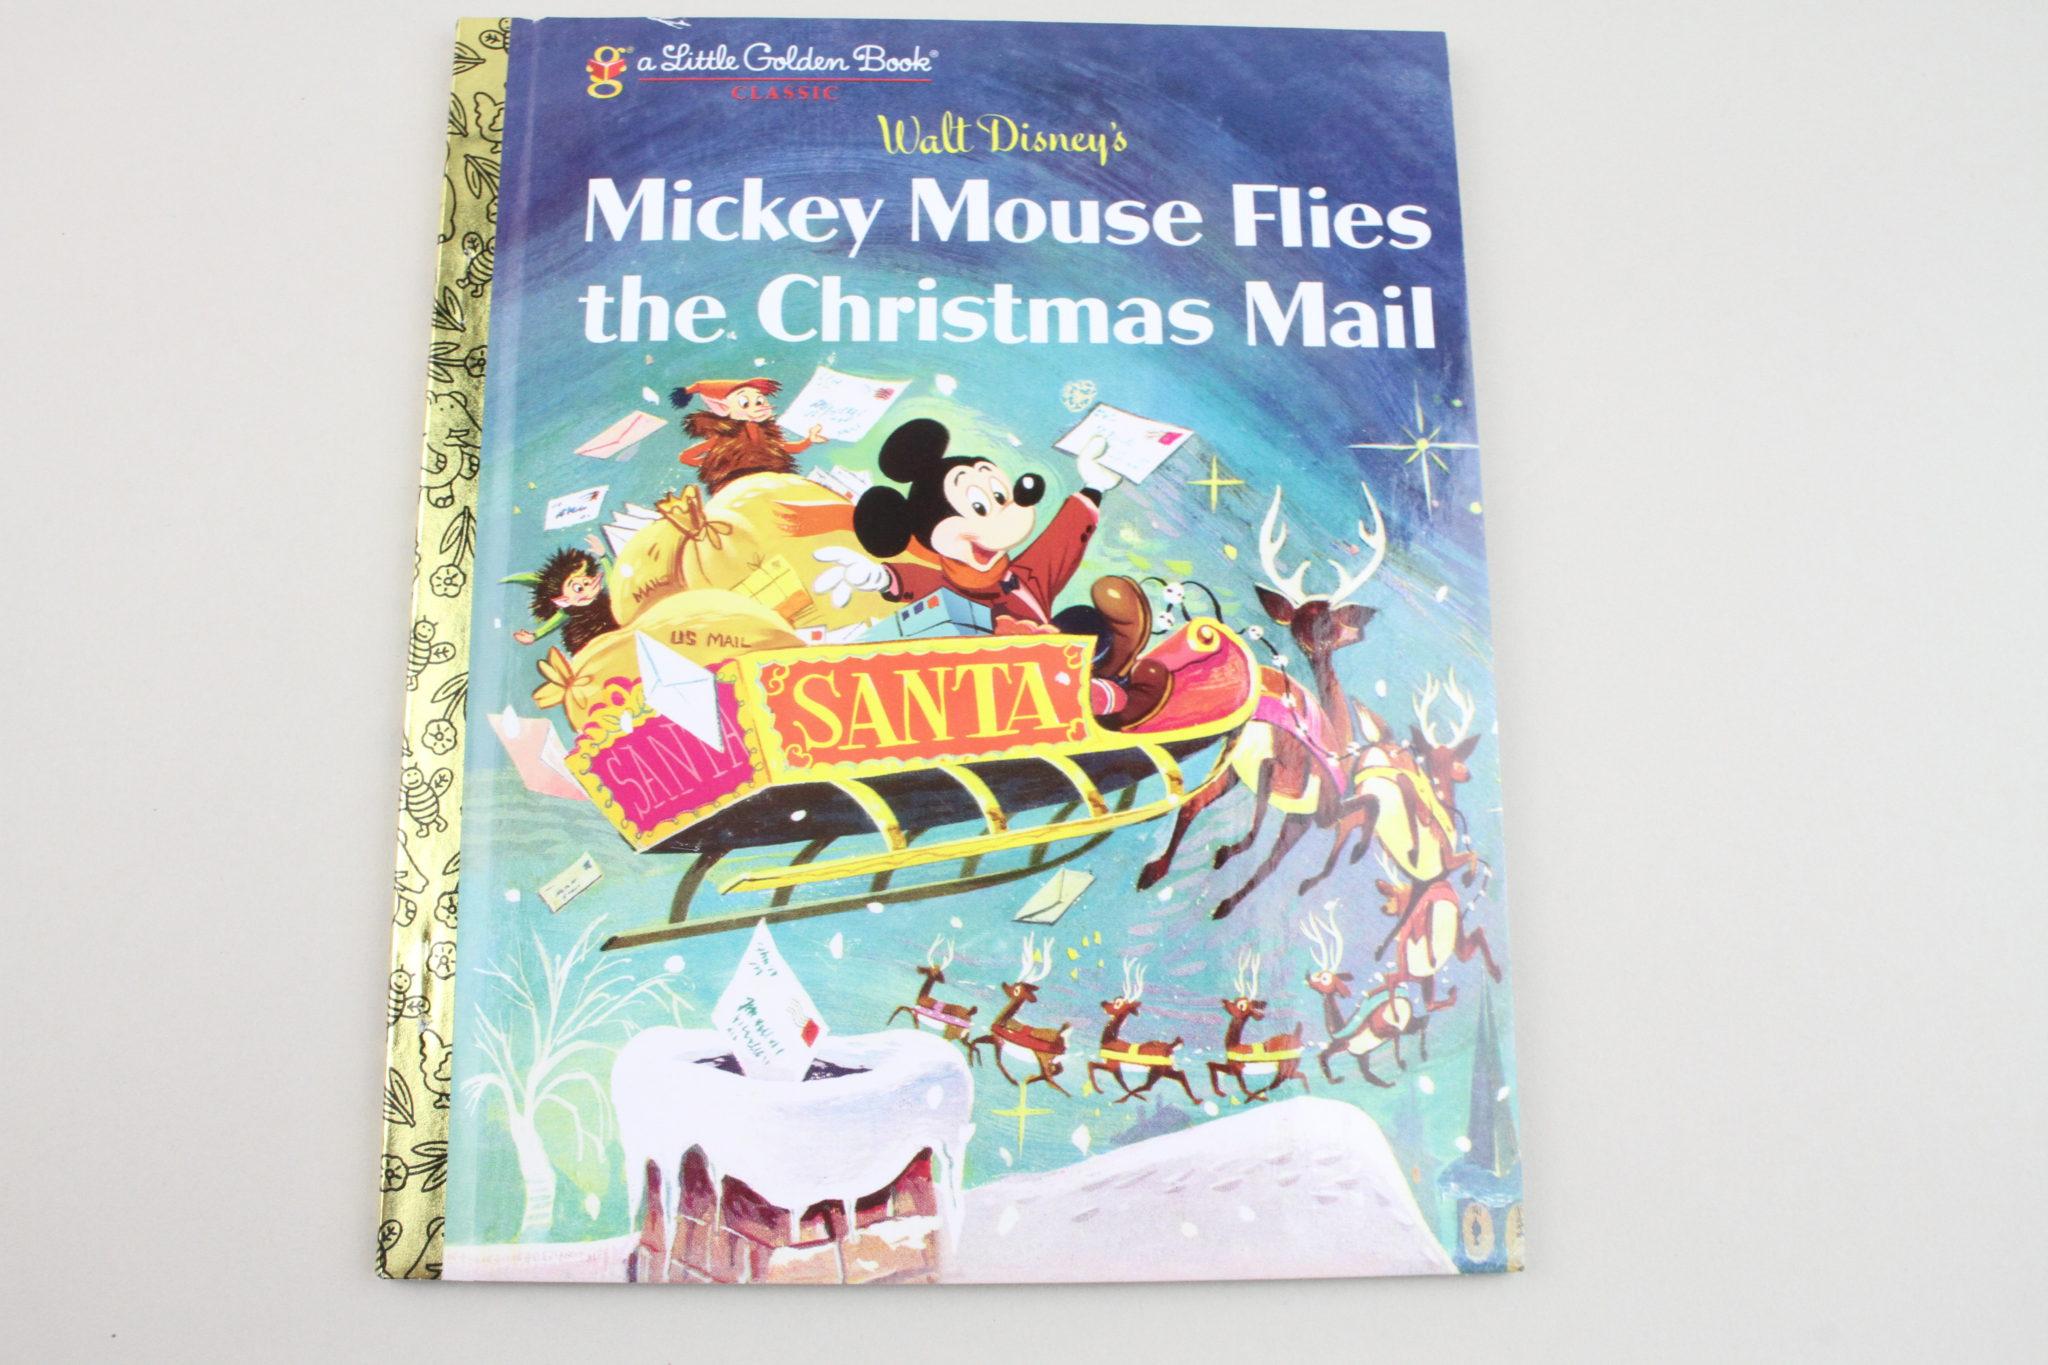 Little Golden Book Walt Disney's Mickey Mouse Flies the Christmas Mail